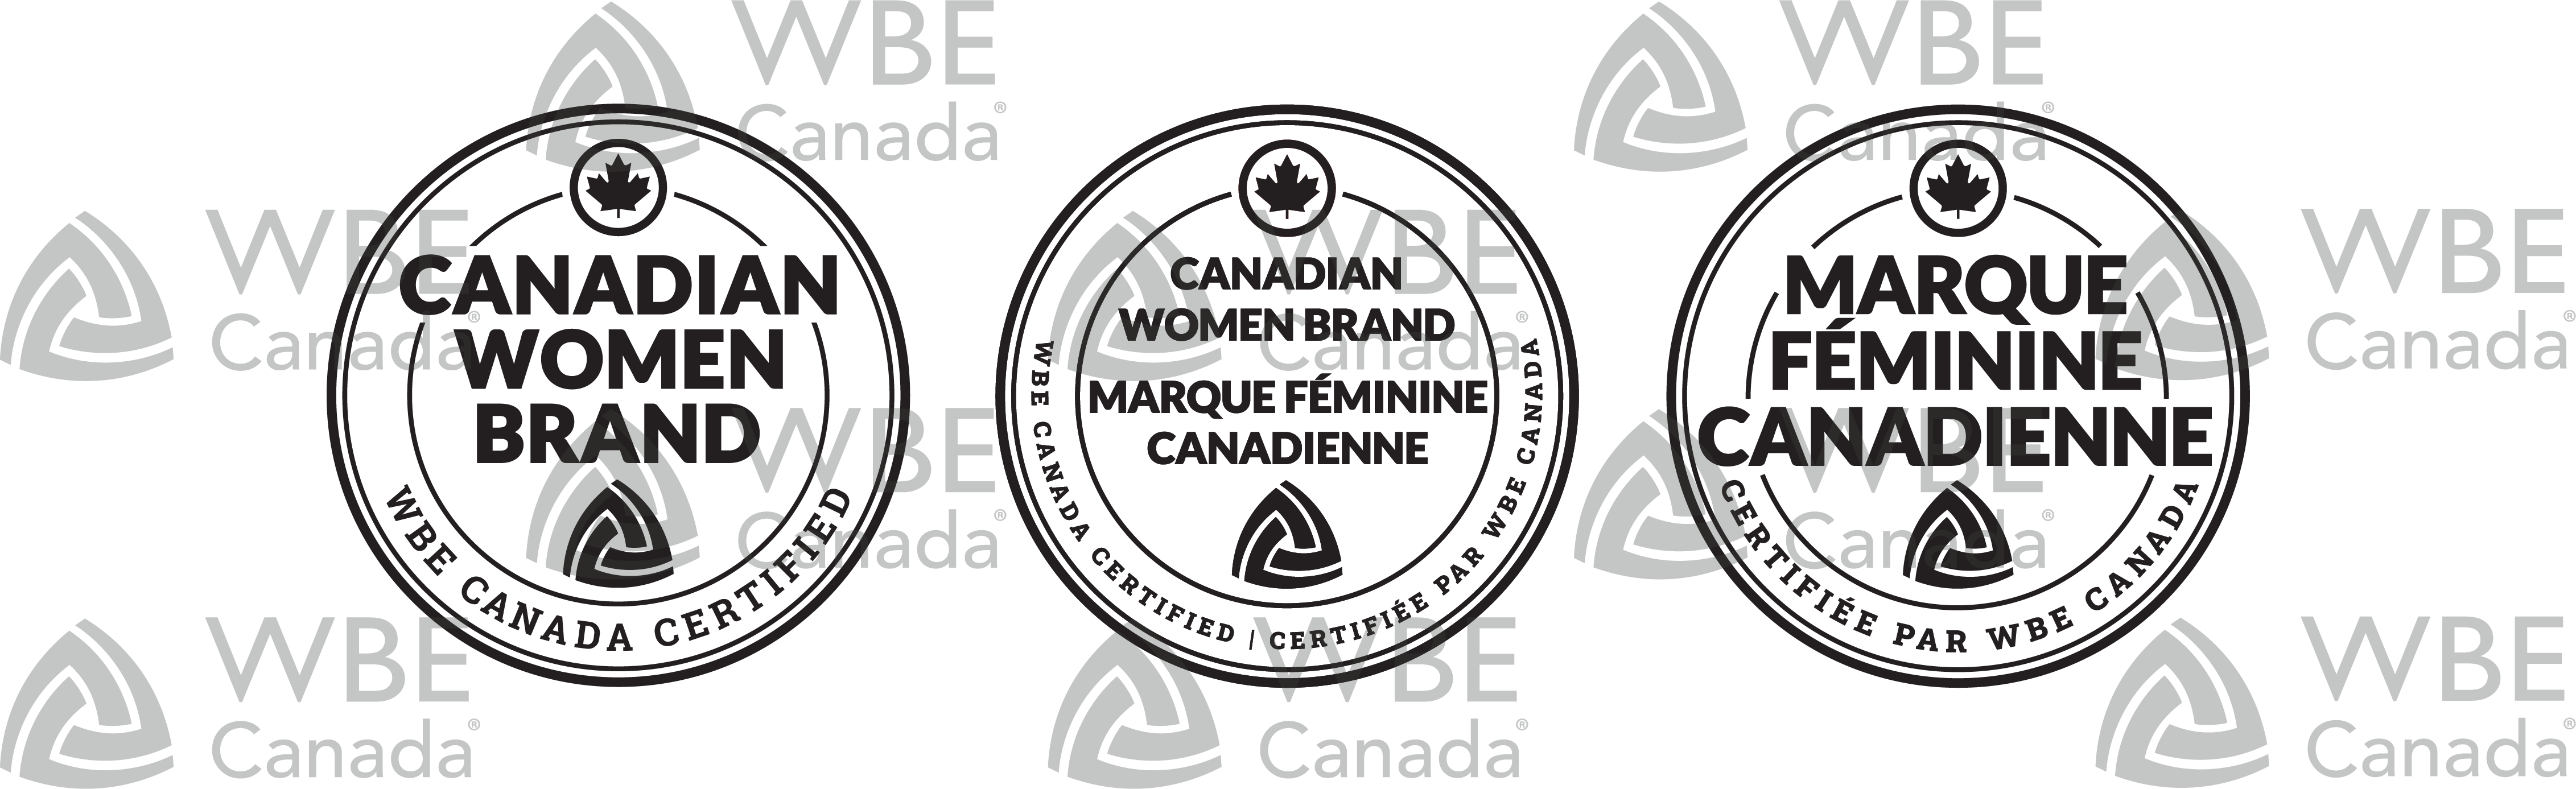 Canadian Women Brand Watermark